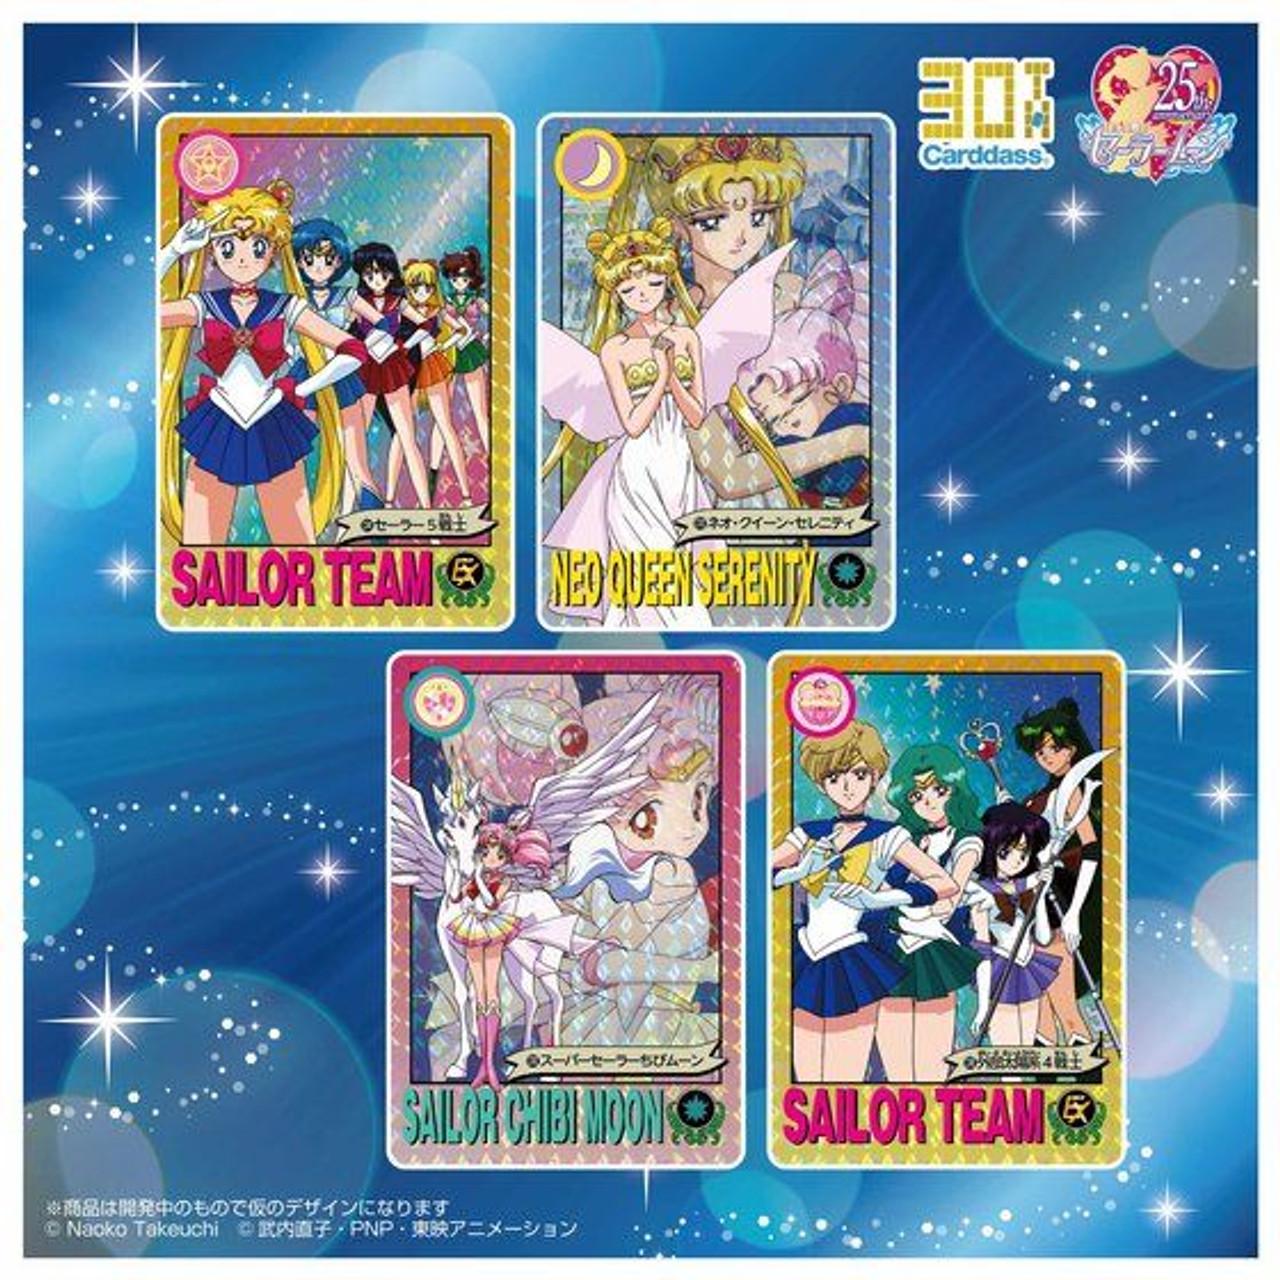 Sailor moon carddass graffiti 202